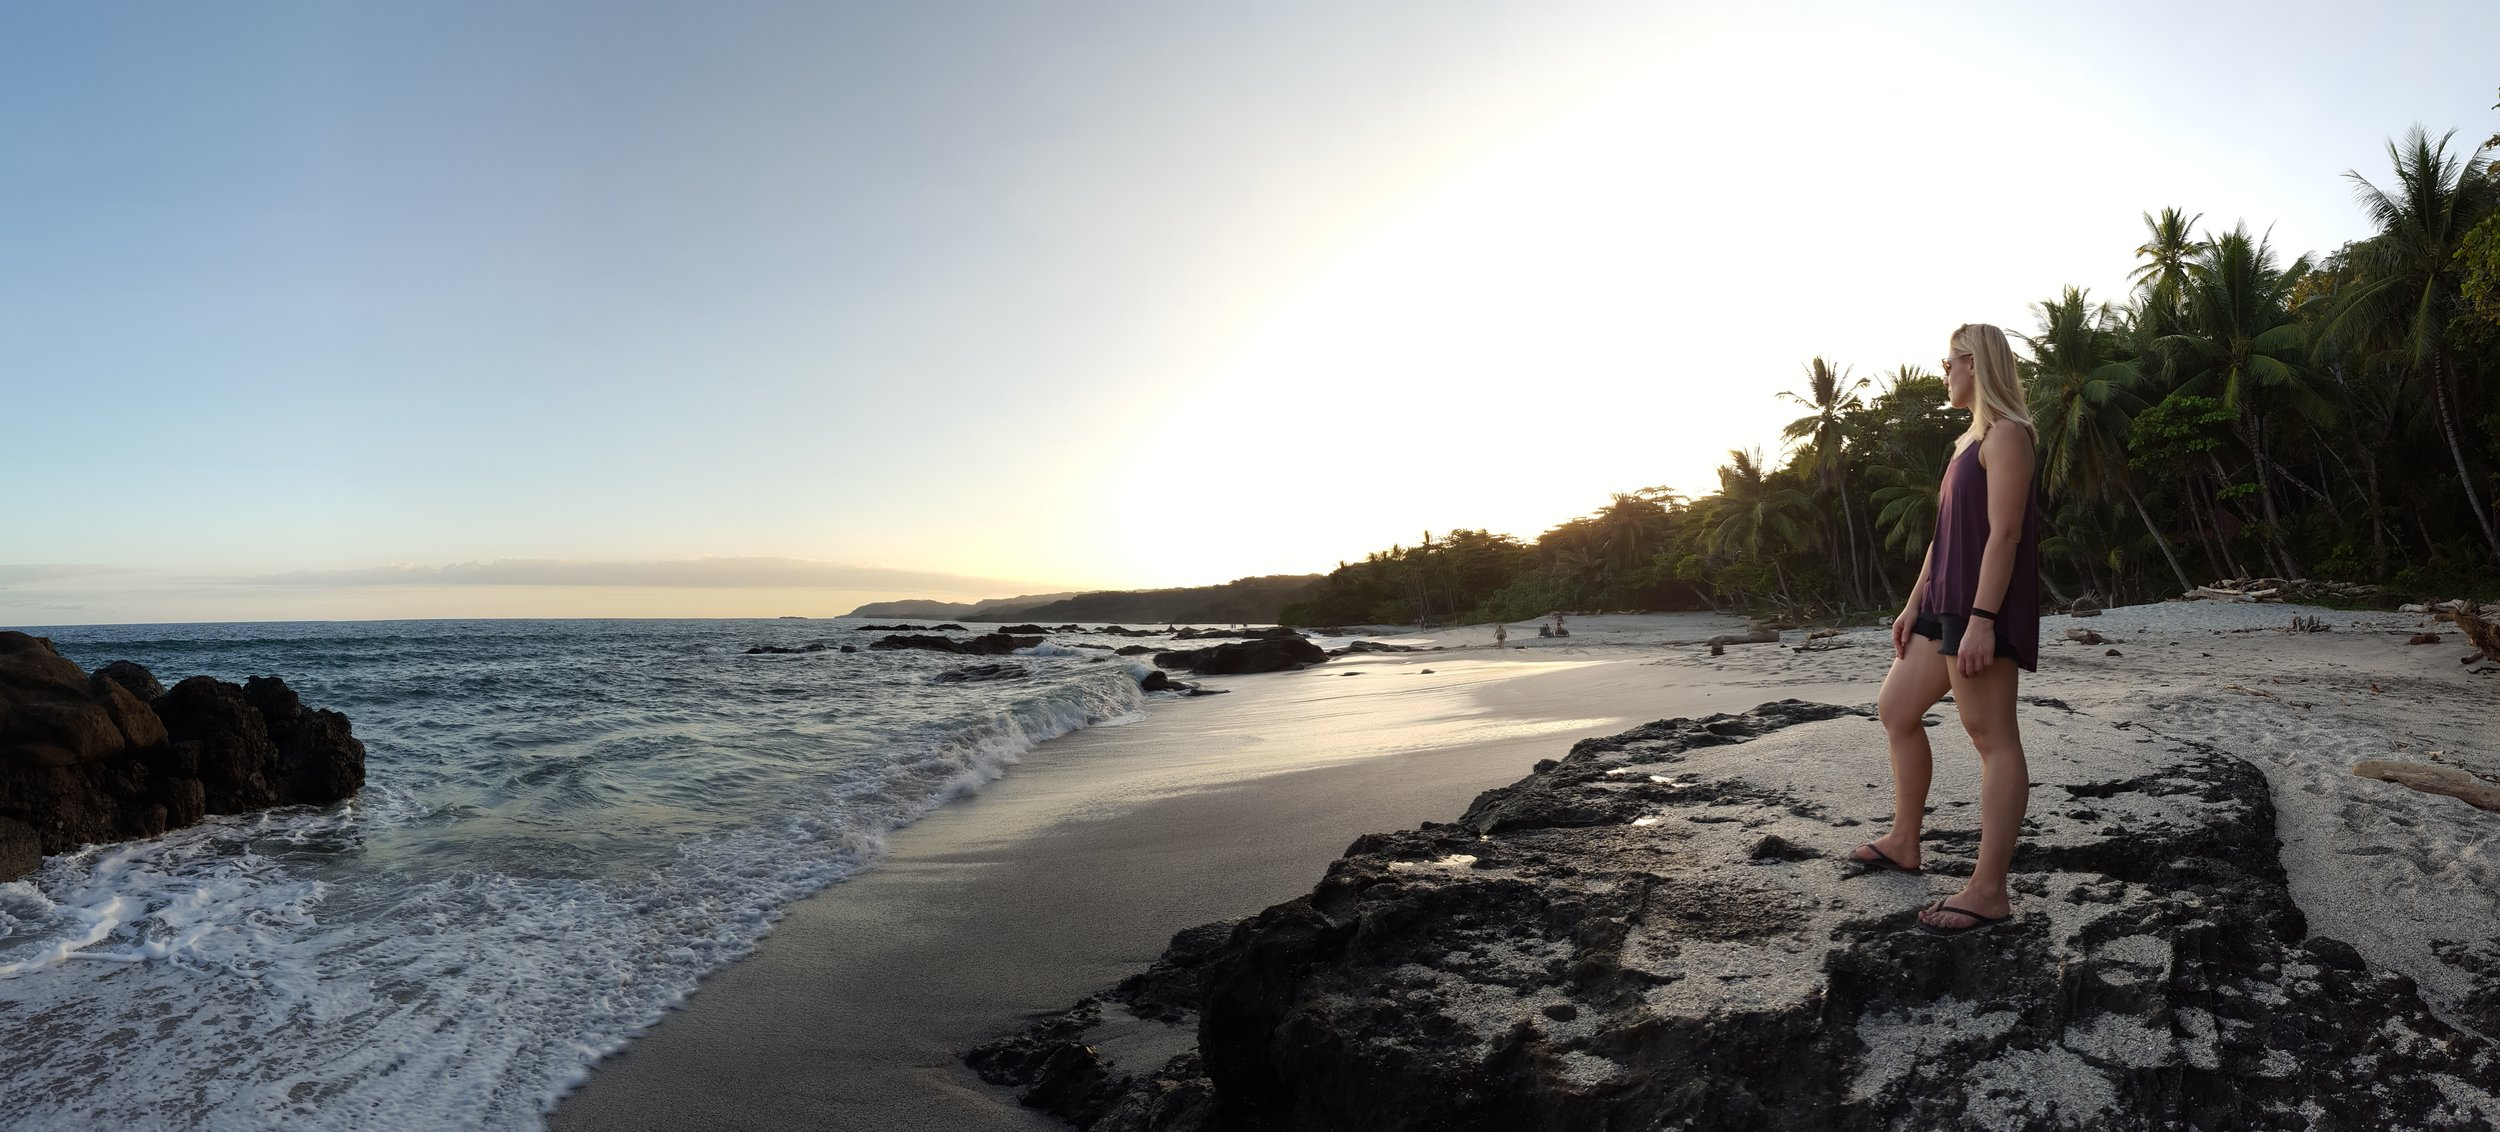 3-ylang ylang beach costa rica.jpg